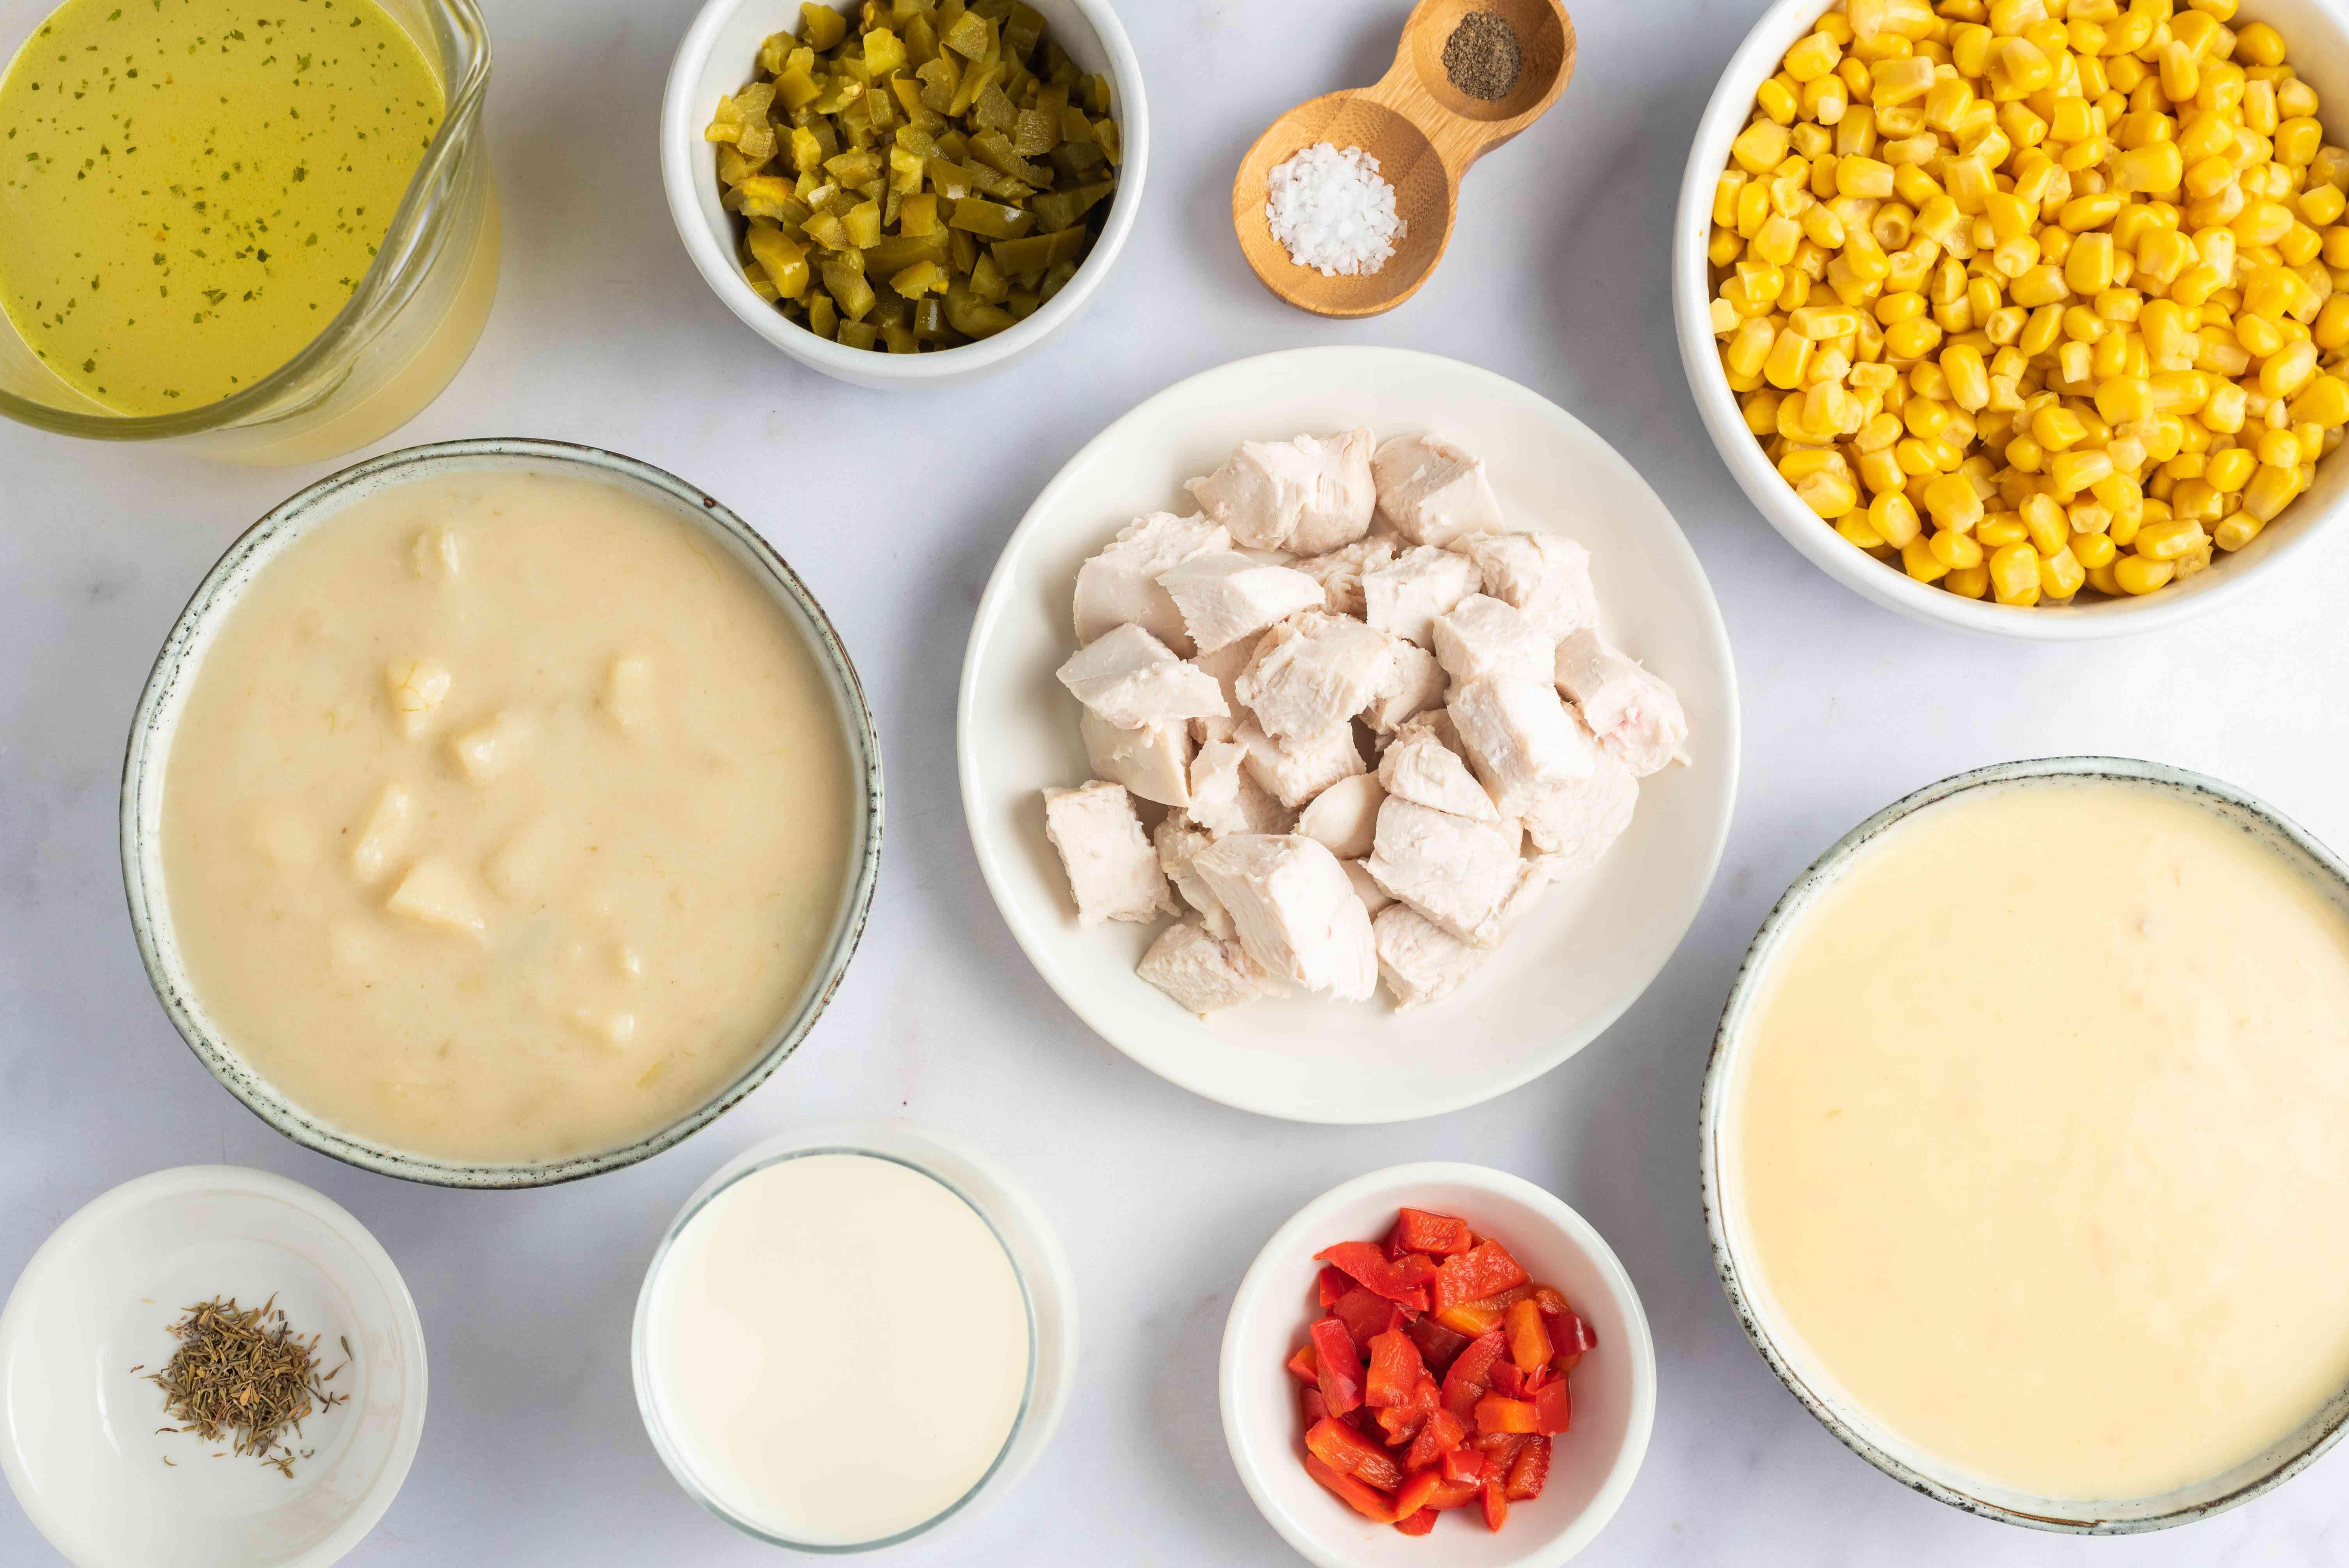 Ingredients for crockpot chicken and corn chowder